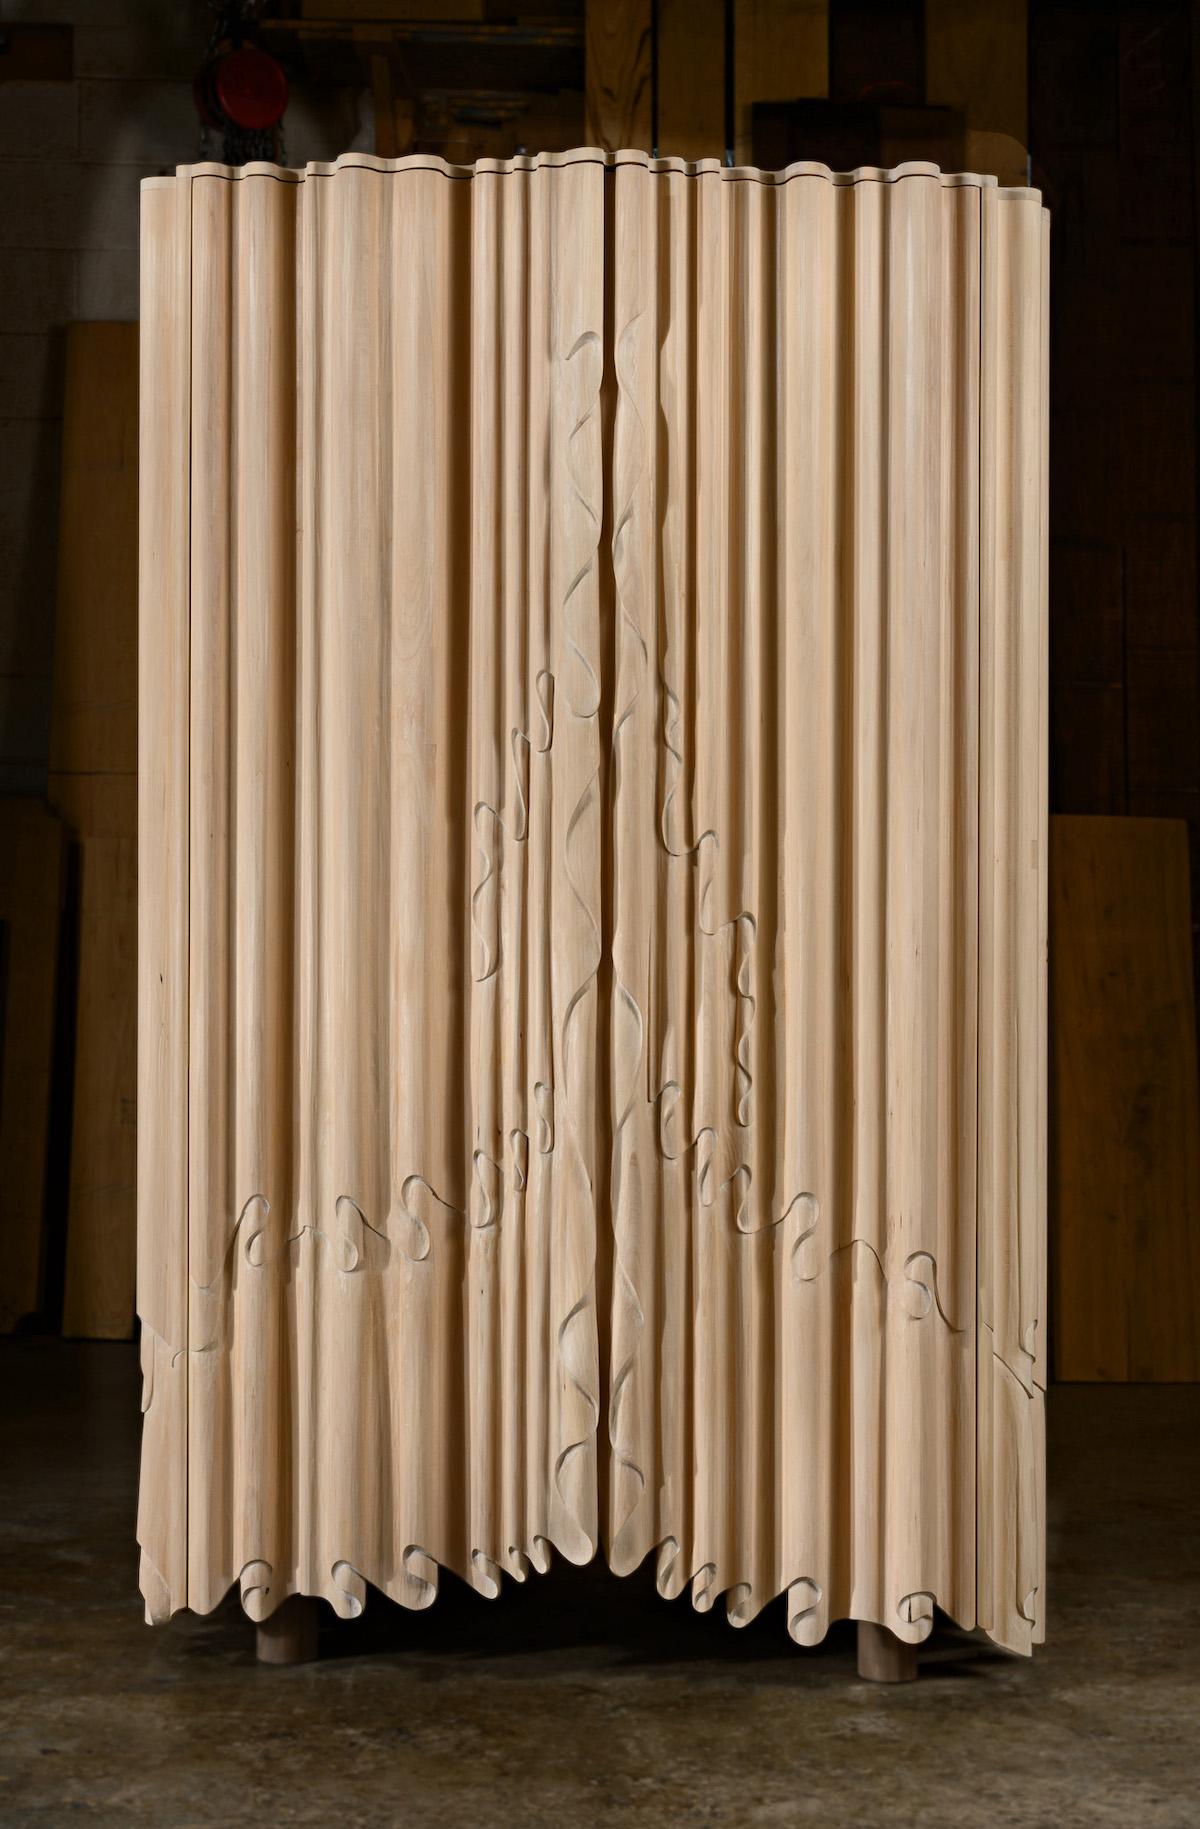 Linenfold Armoire by artist Christopher Kurtz